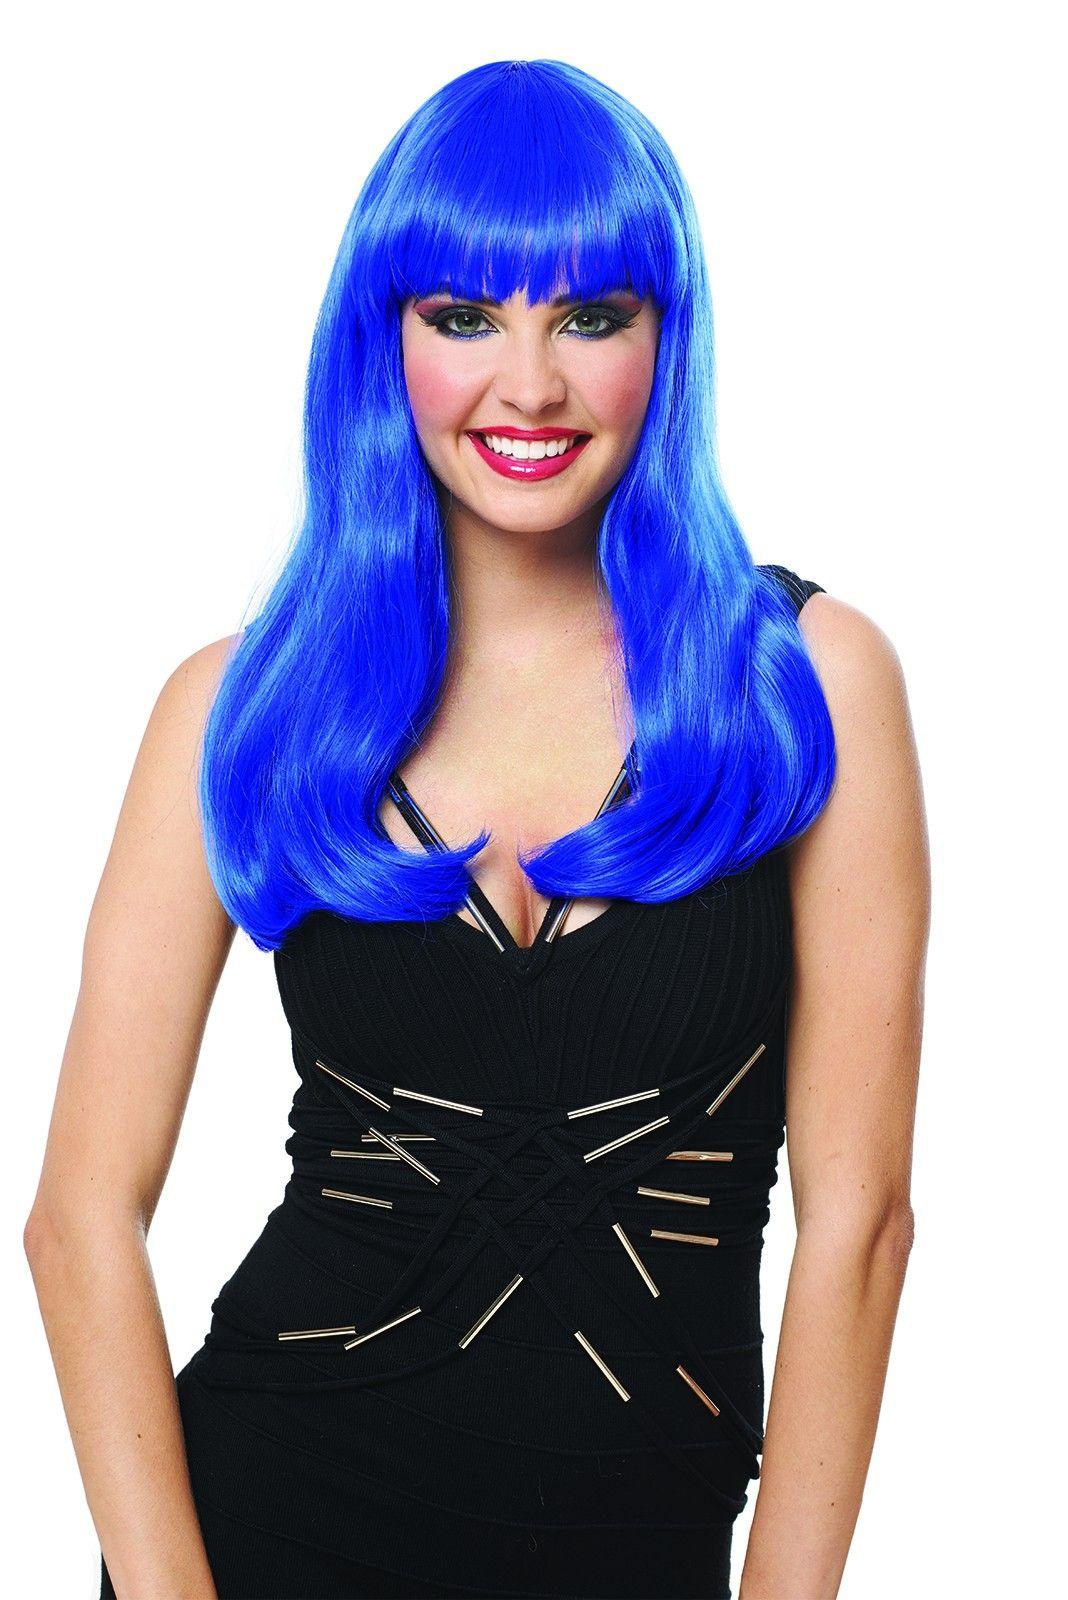 Mistress Wig Wigs Accessories Wigs Wig Accessories Mistress